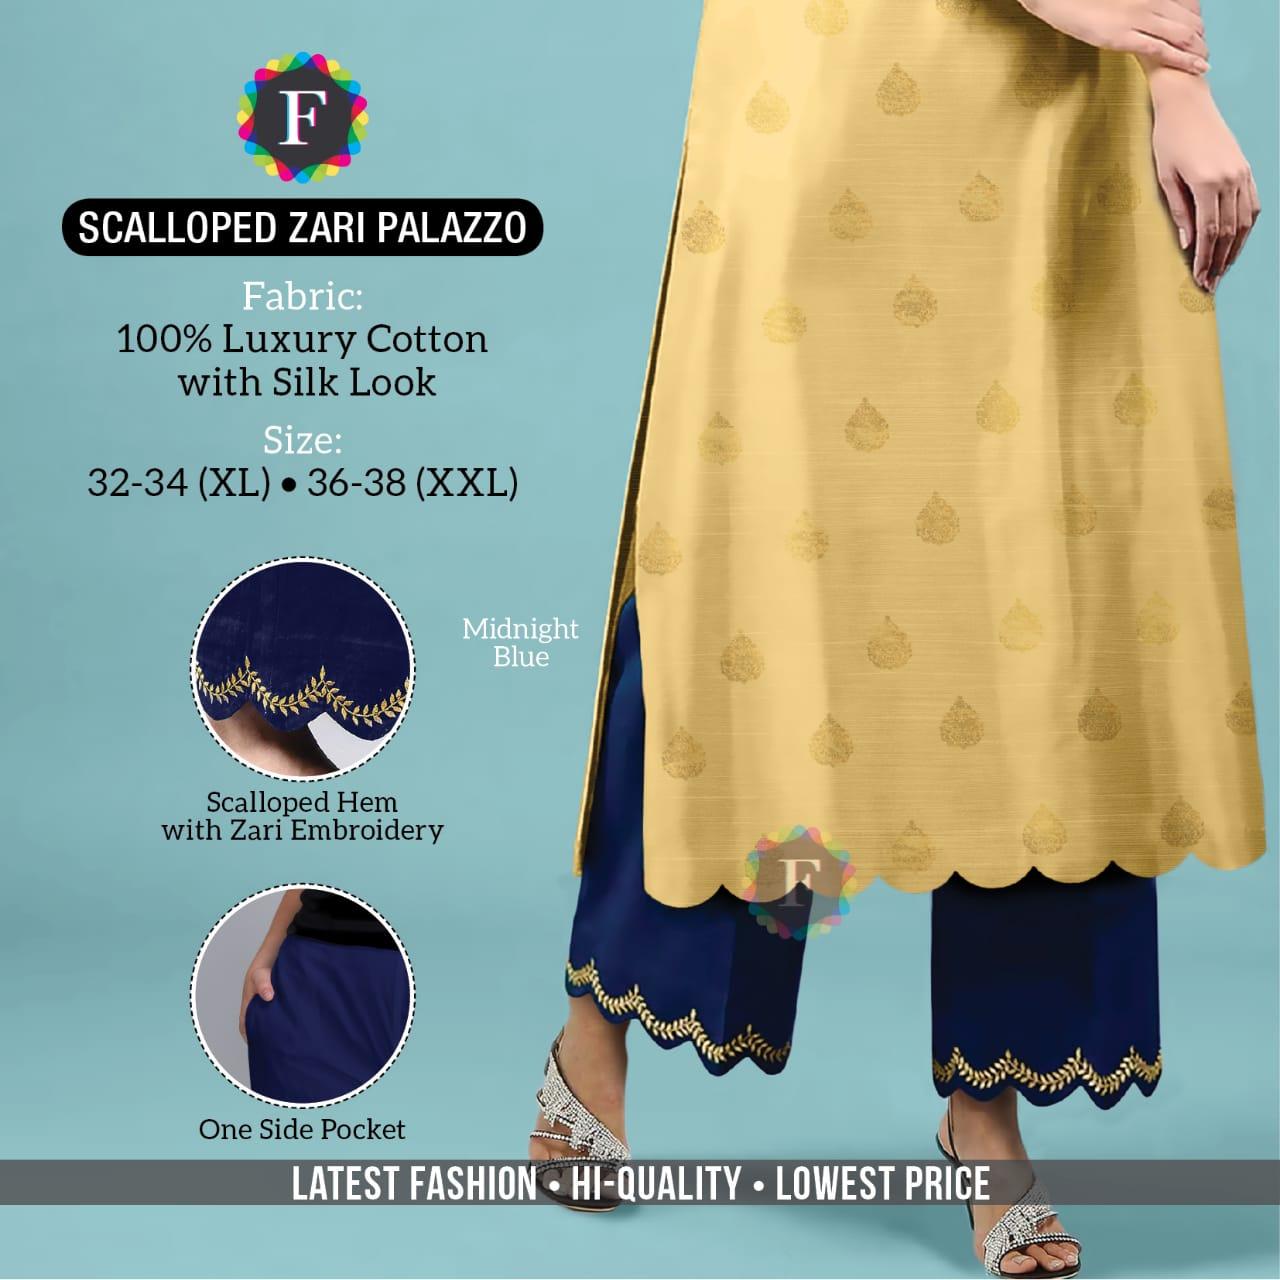 Scalloped Zari Palazzo Ethnic Western Wear Bottom Plazo Collection